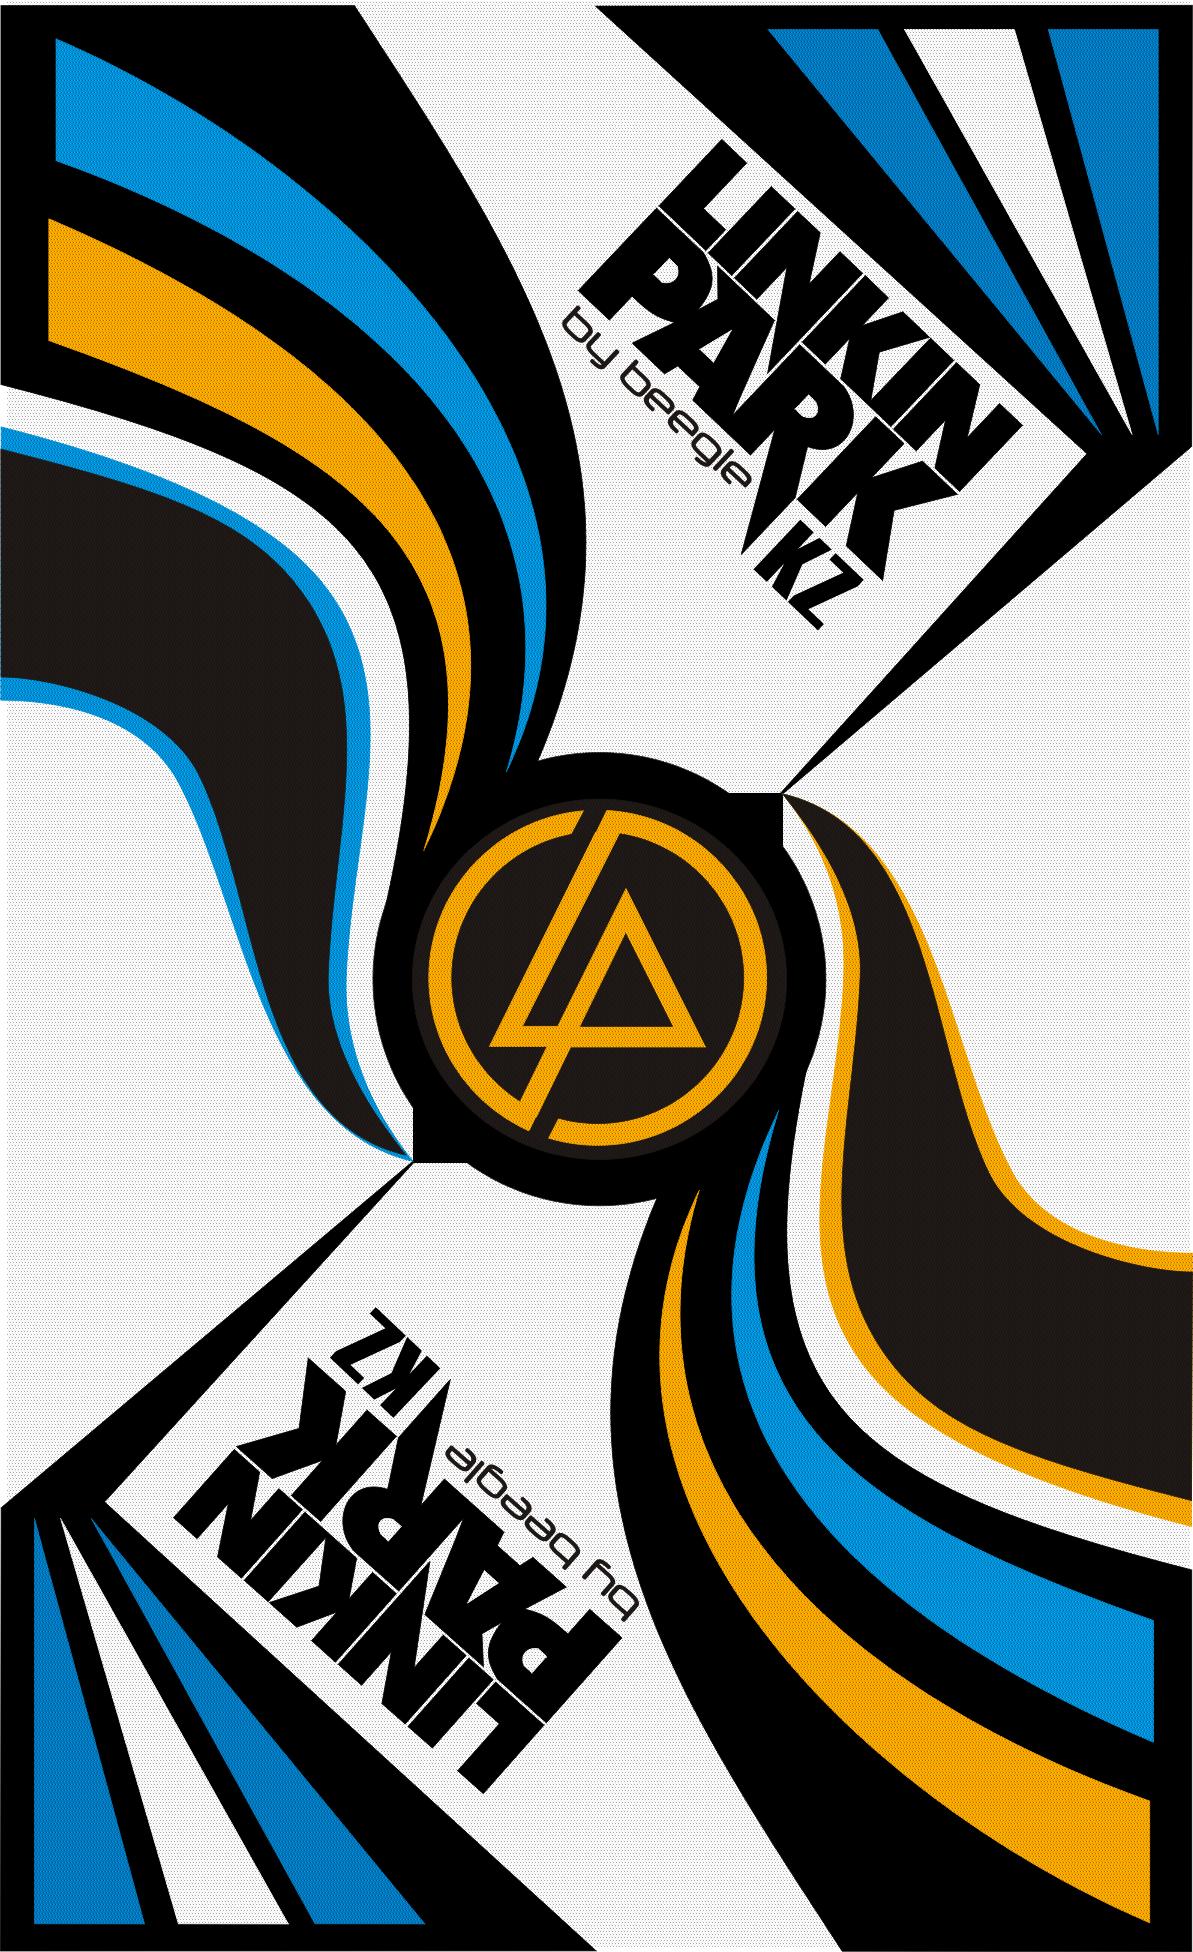 Linkin Park Poster By Beegle Lp On Deviantart